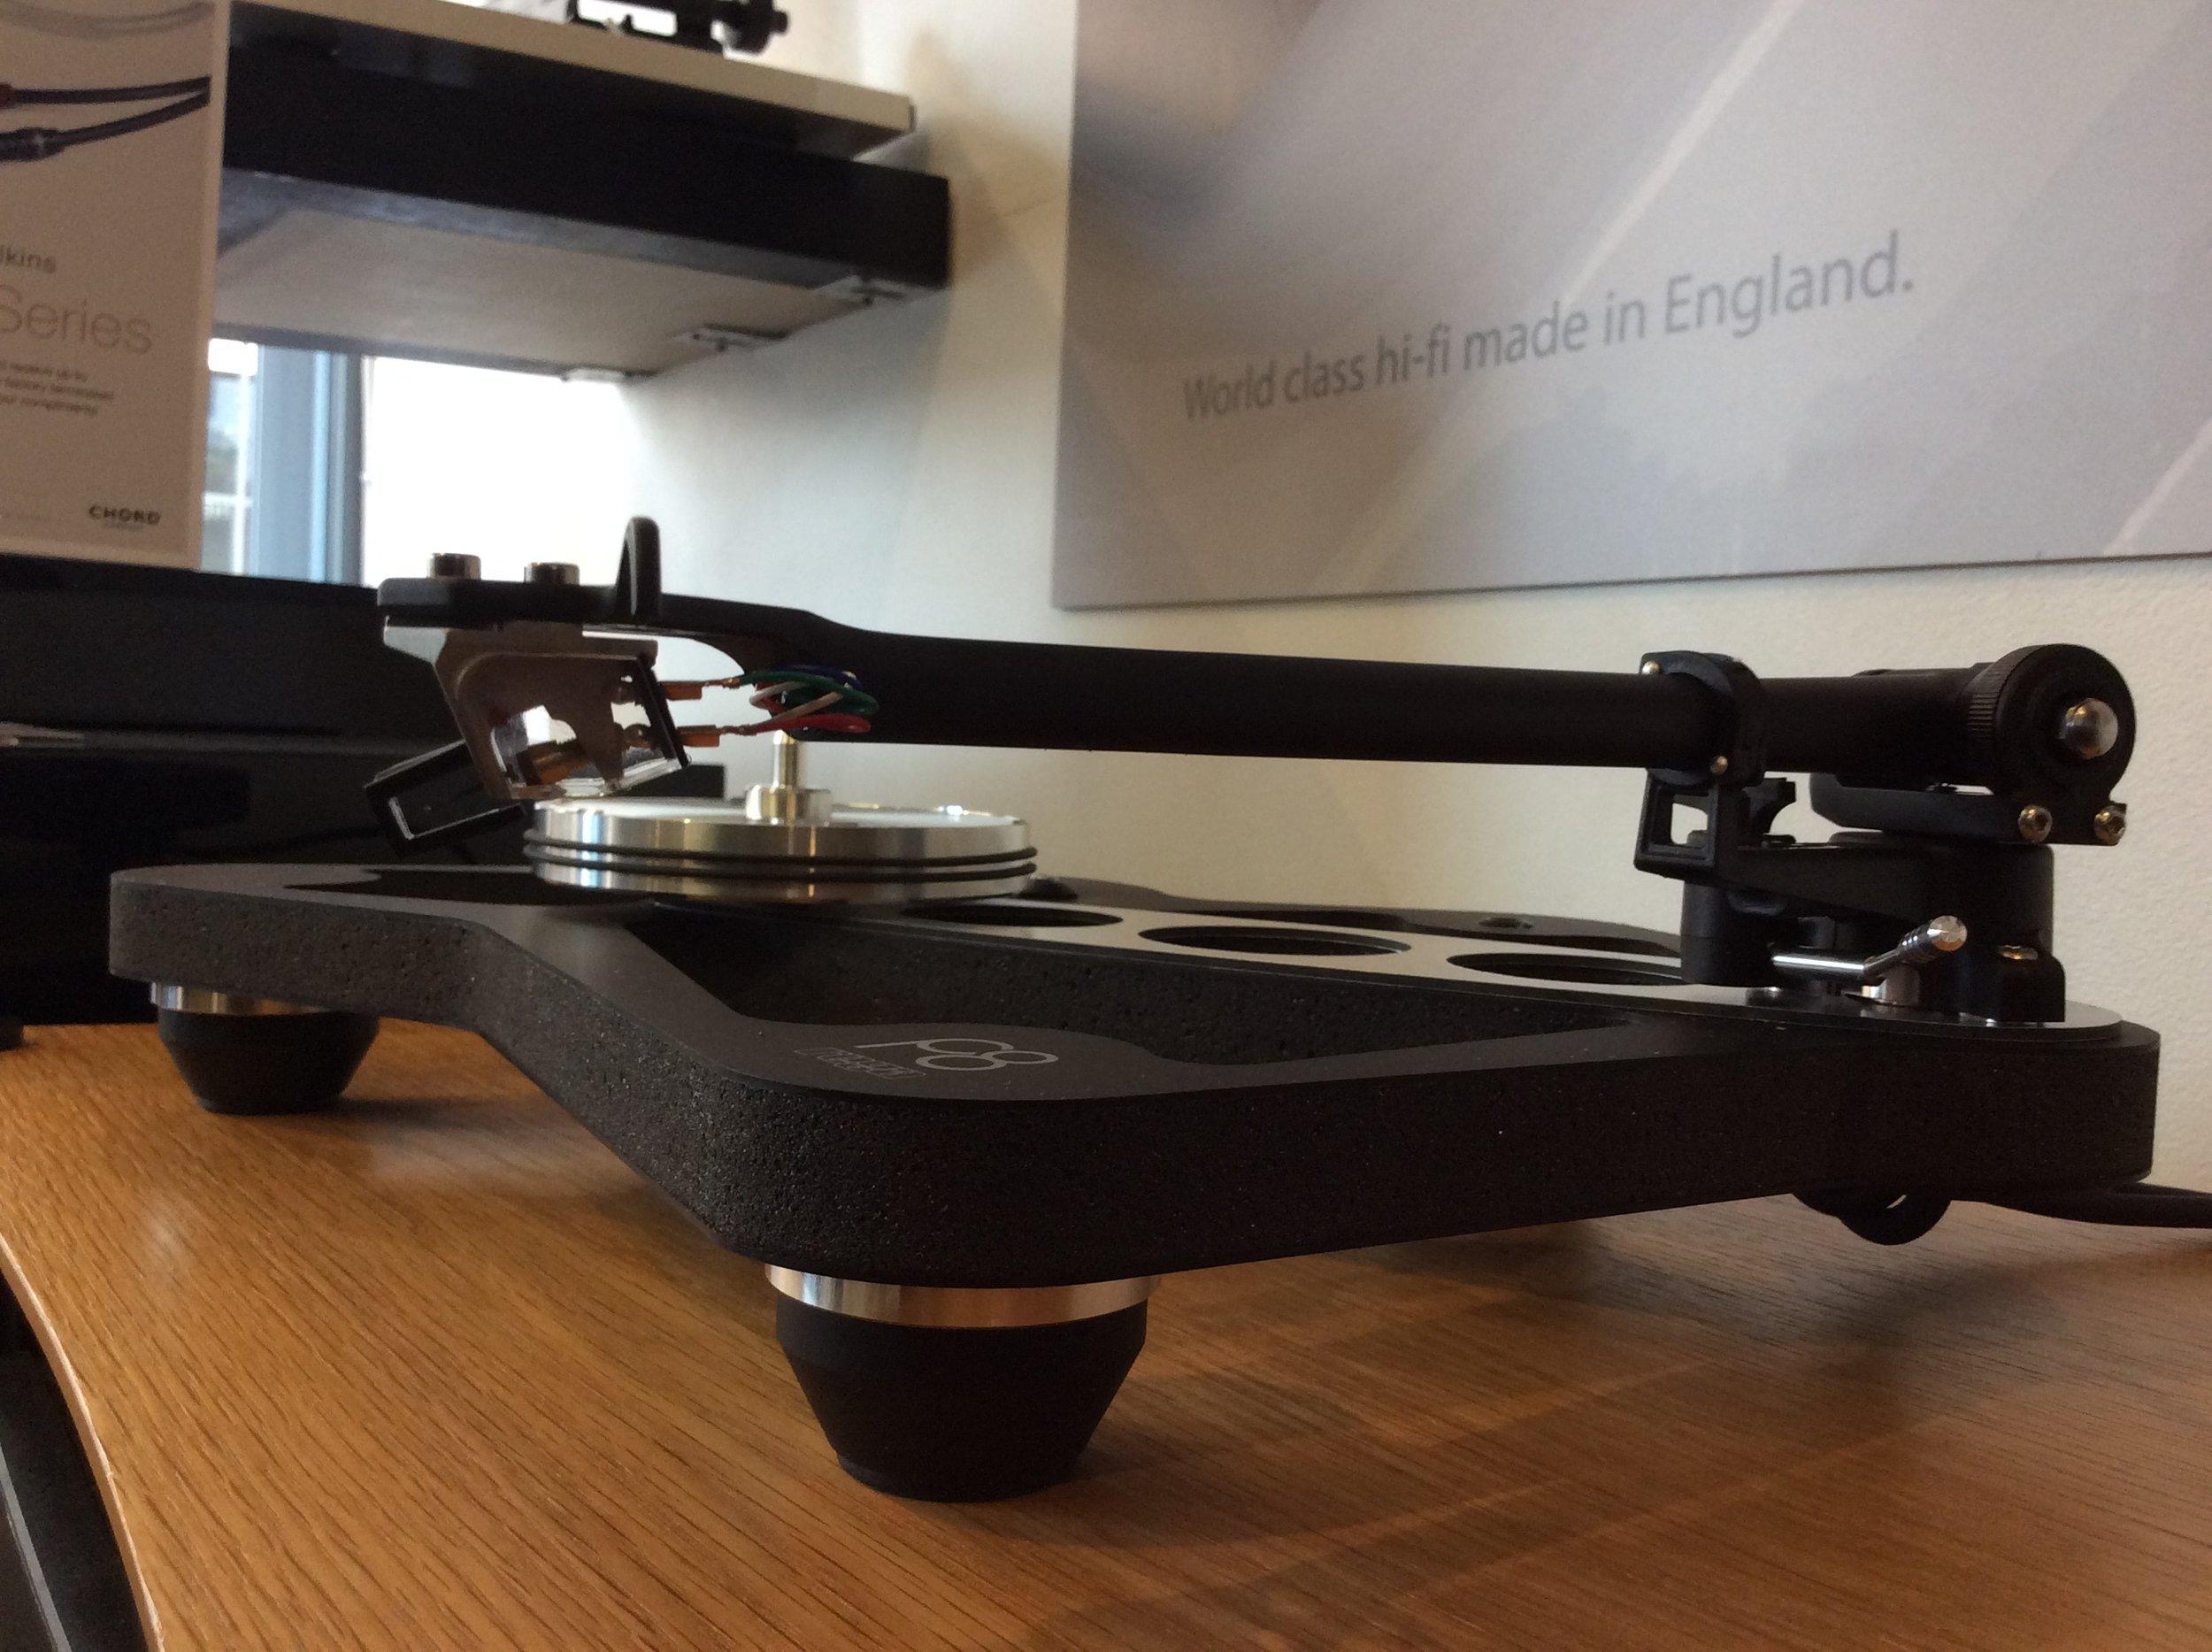 Planar 8 plinth and new RB880 tonearm